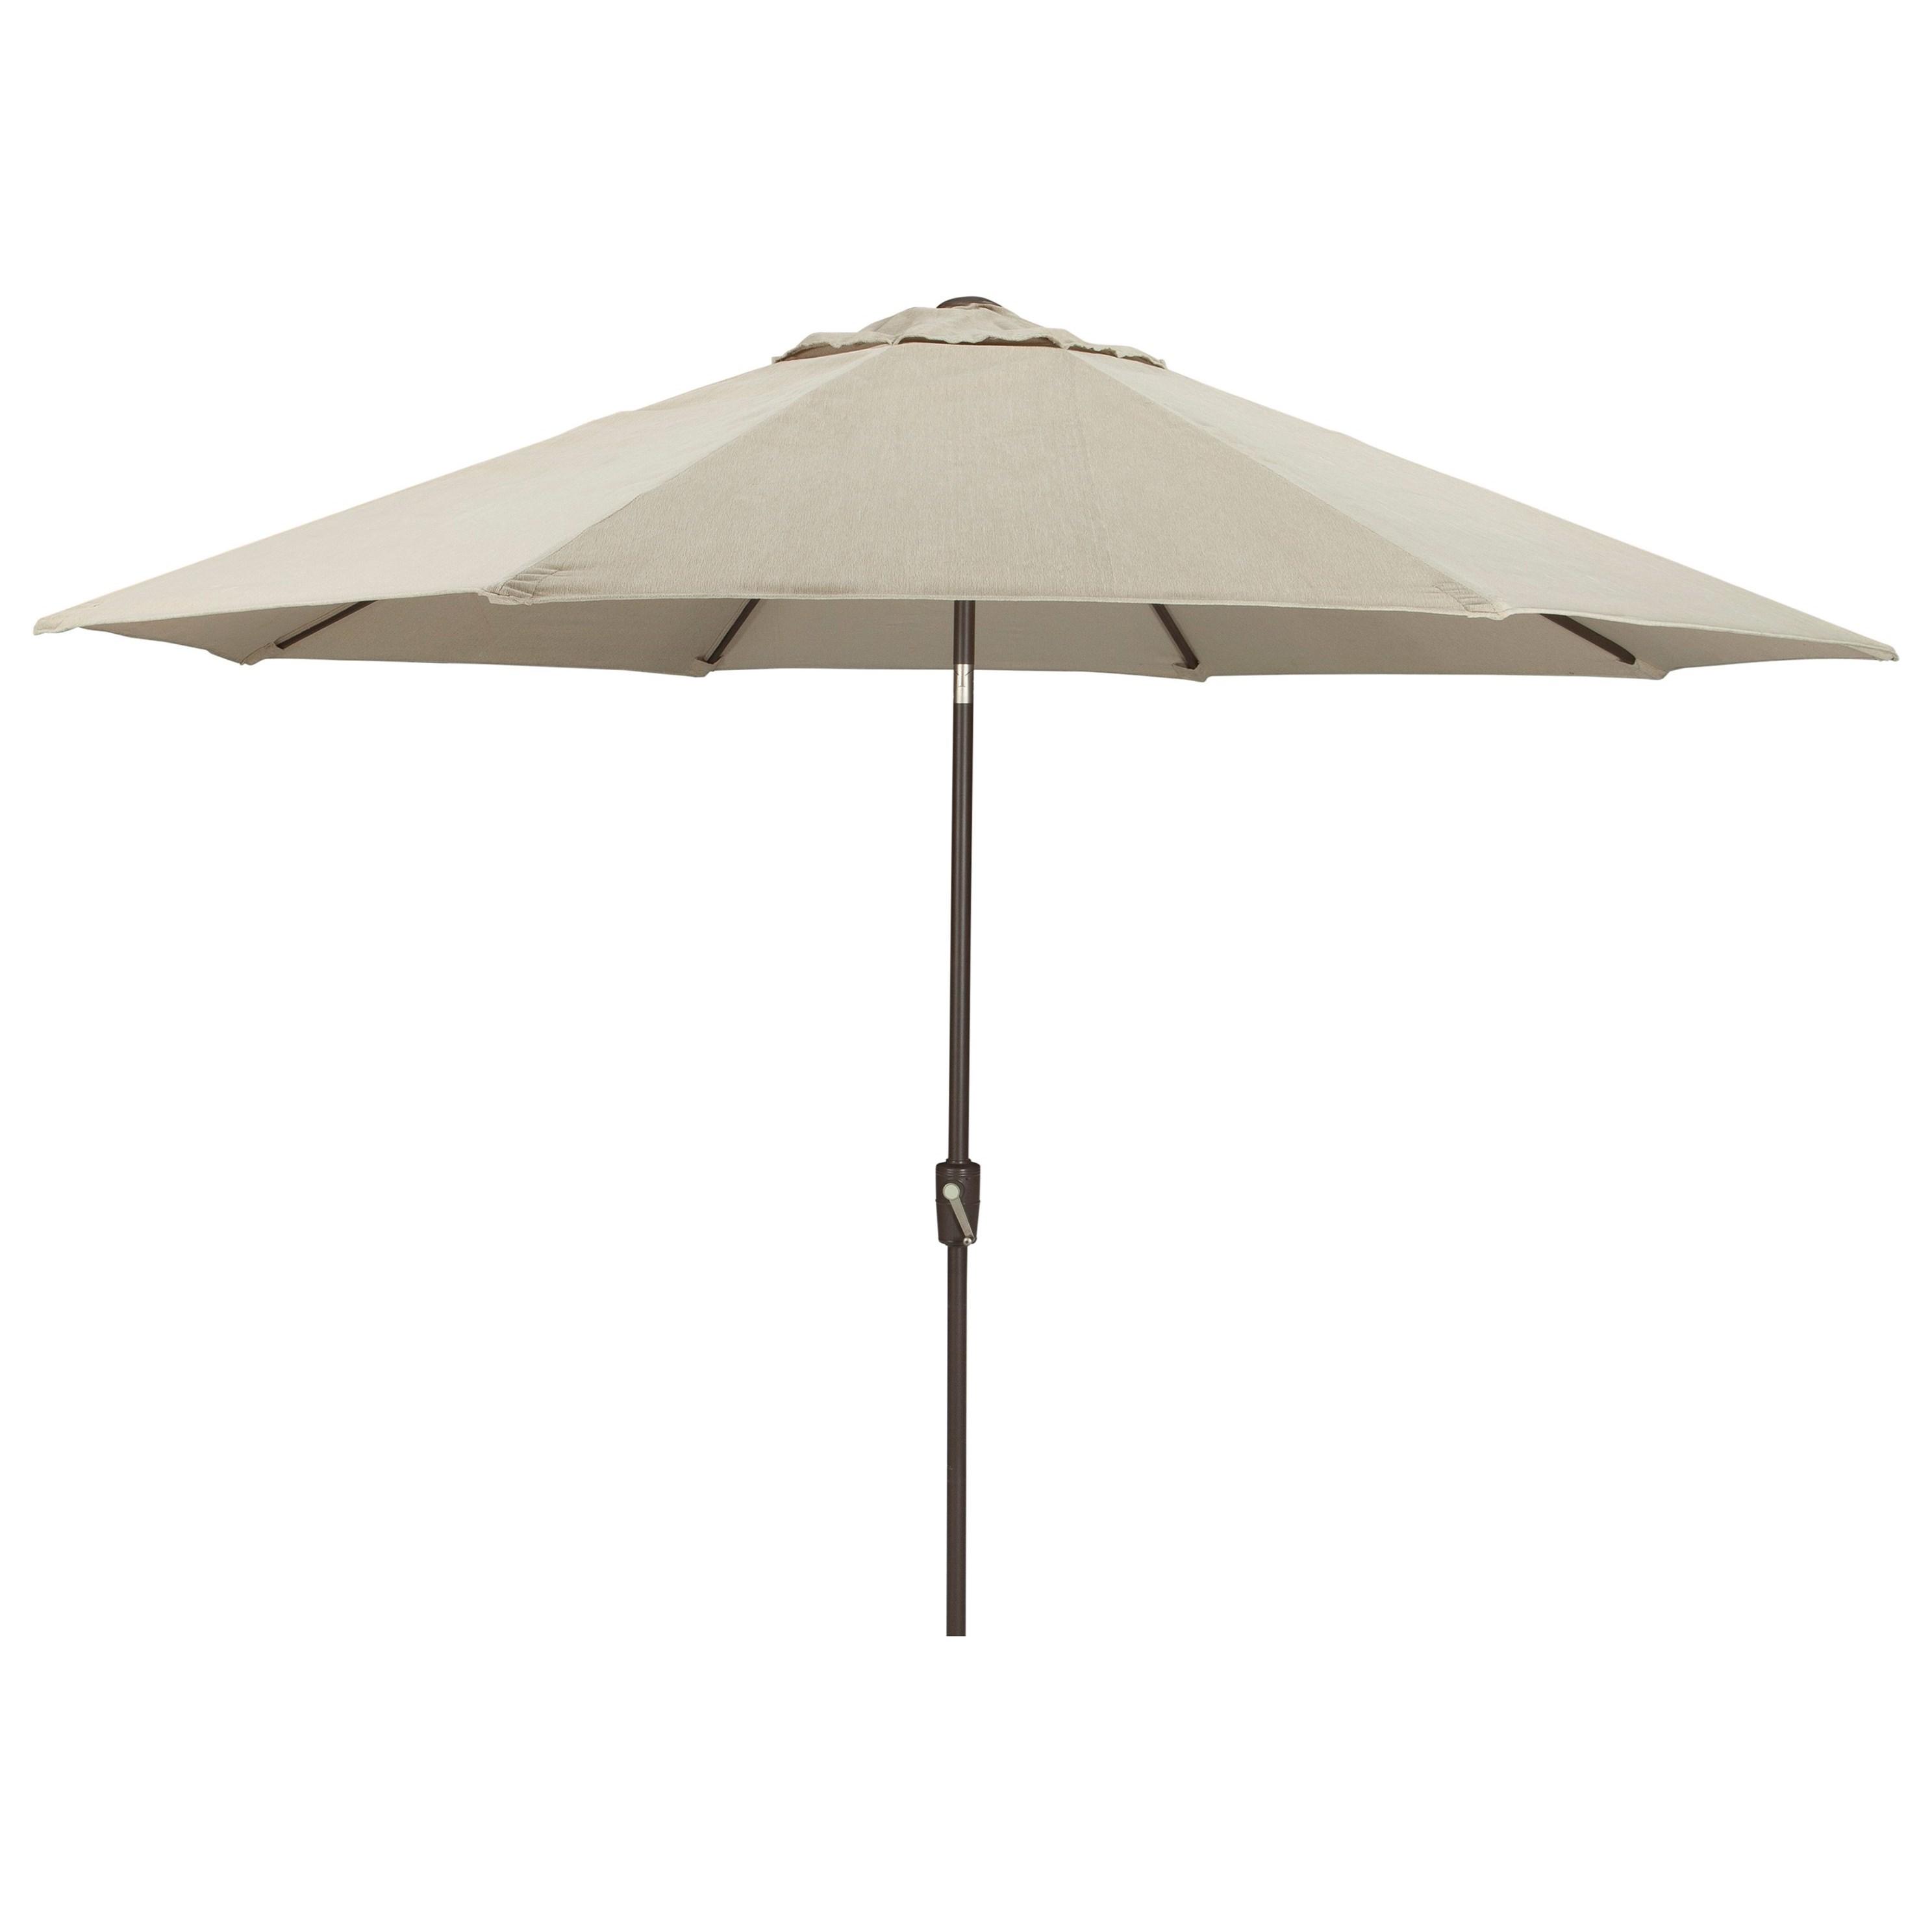 Large Auto Tilt Umbrella